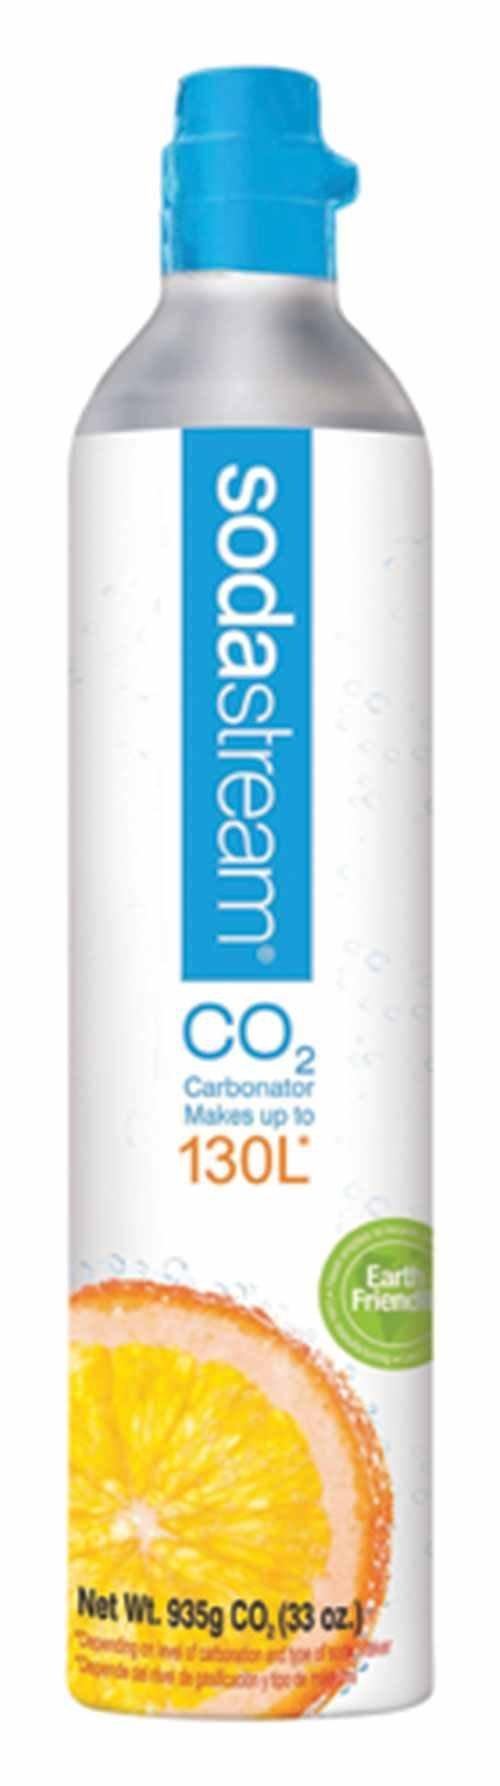 SodaStream Co2 Spare, 130-Liter Carbonator by SodaStream